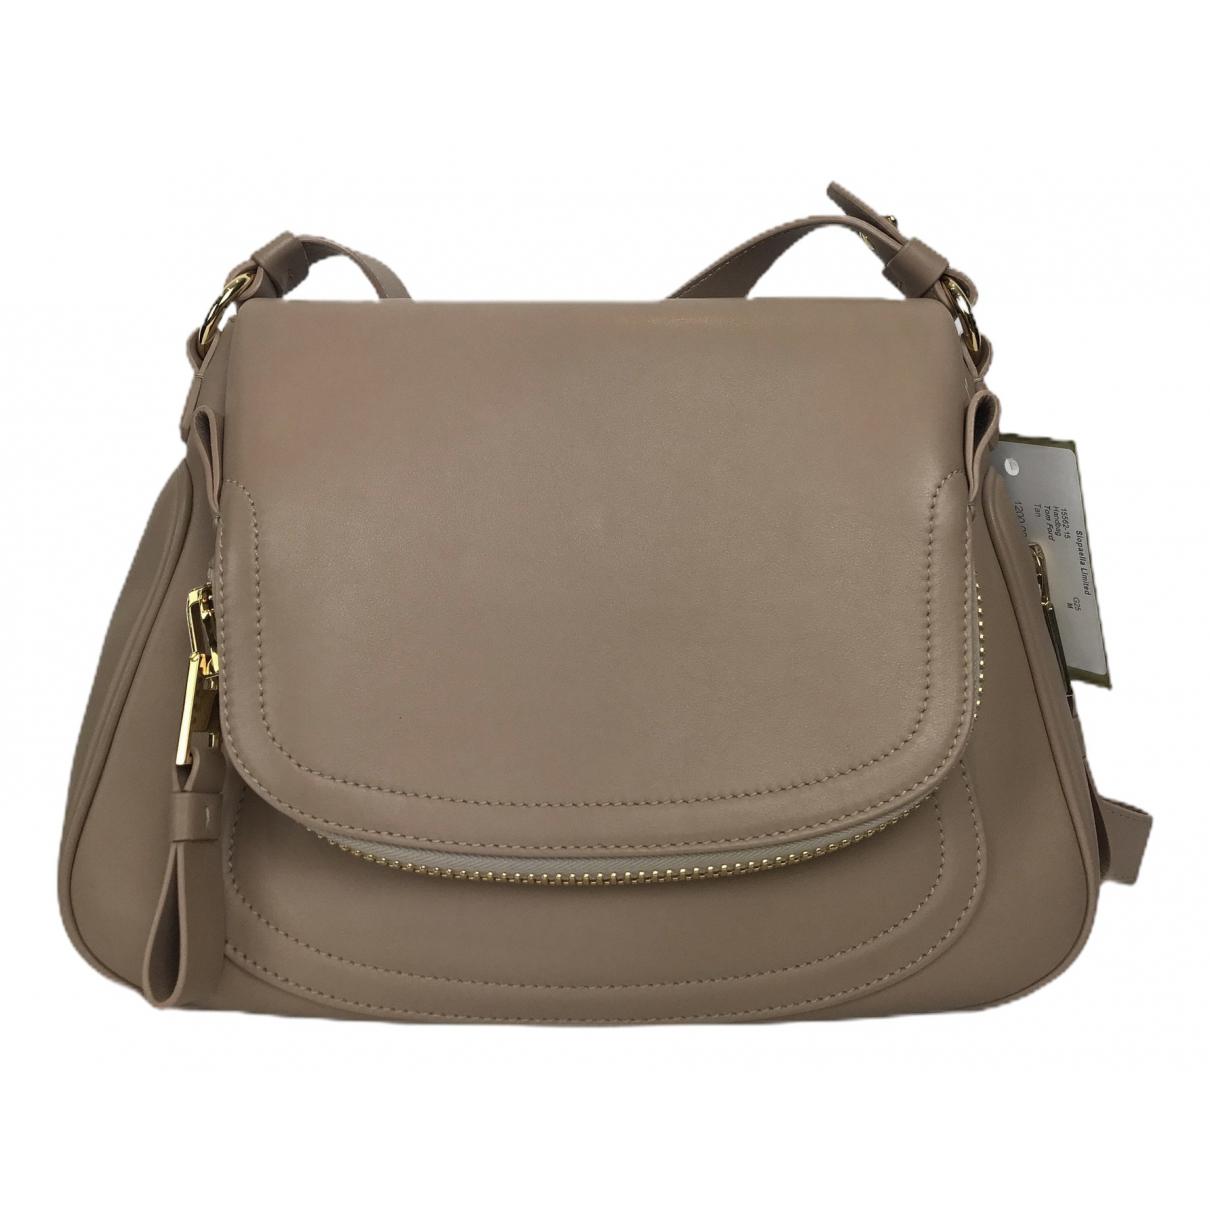 Tom Ford Jennifer Beige Leather handbag for Women \N